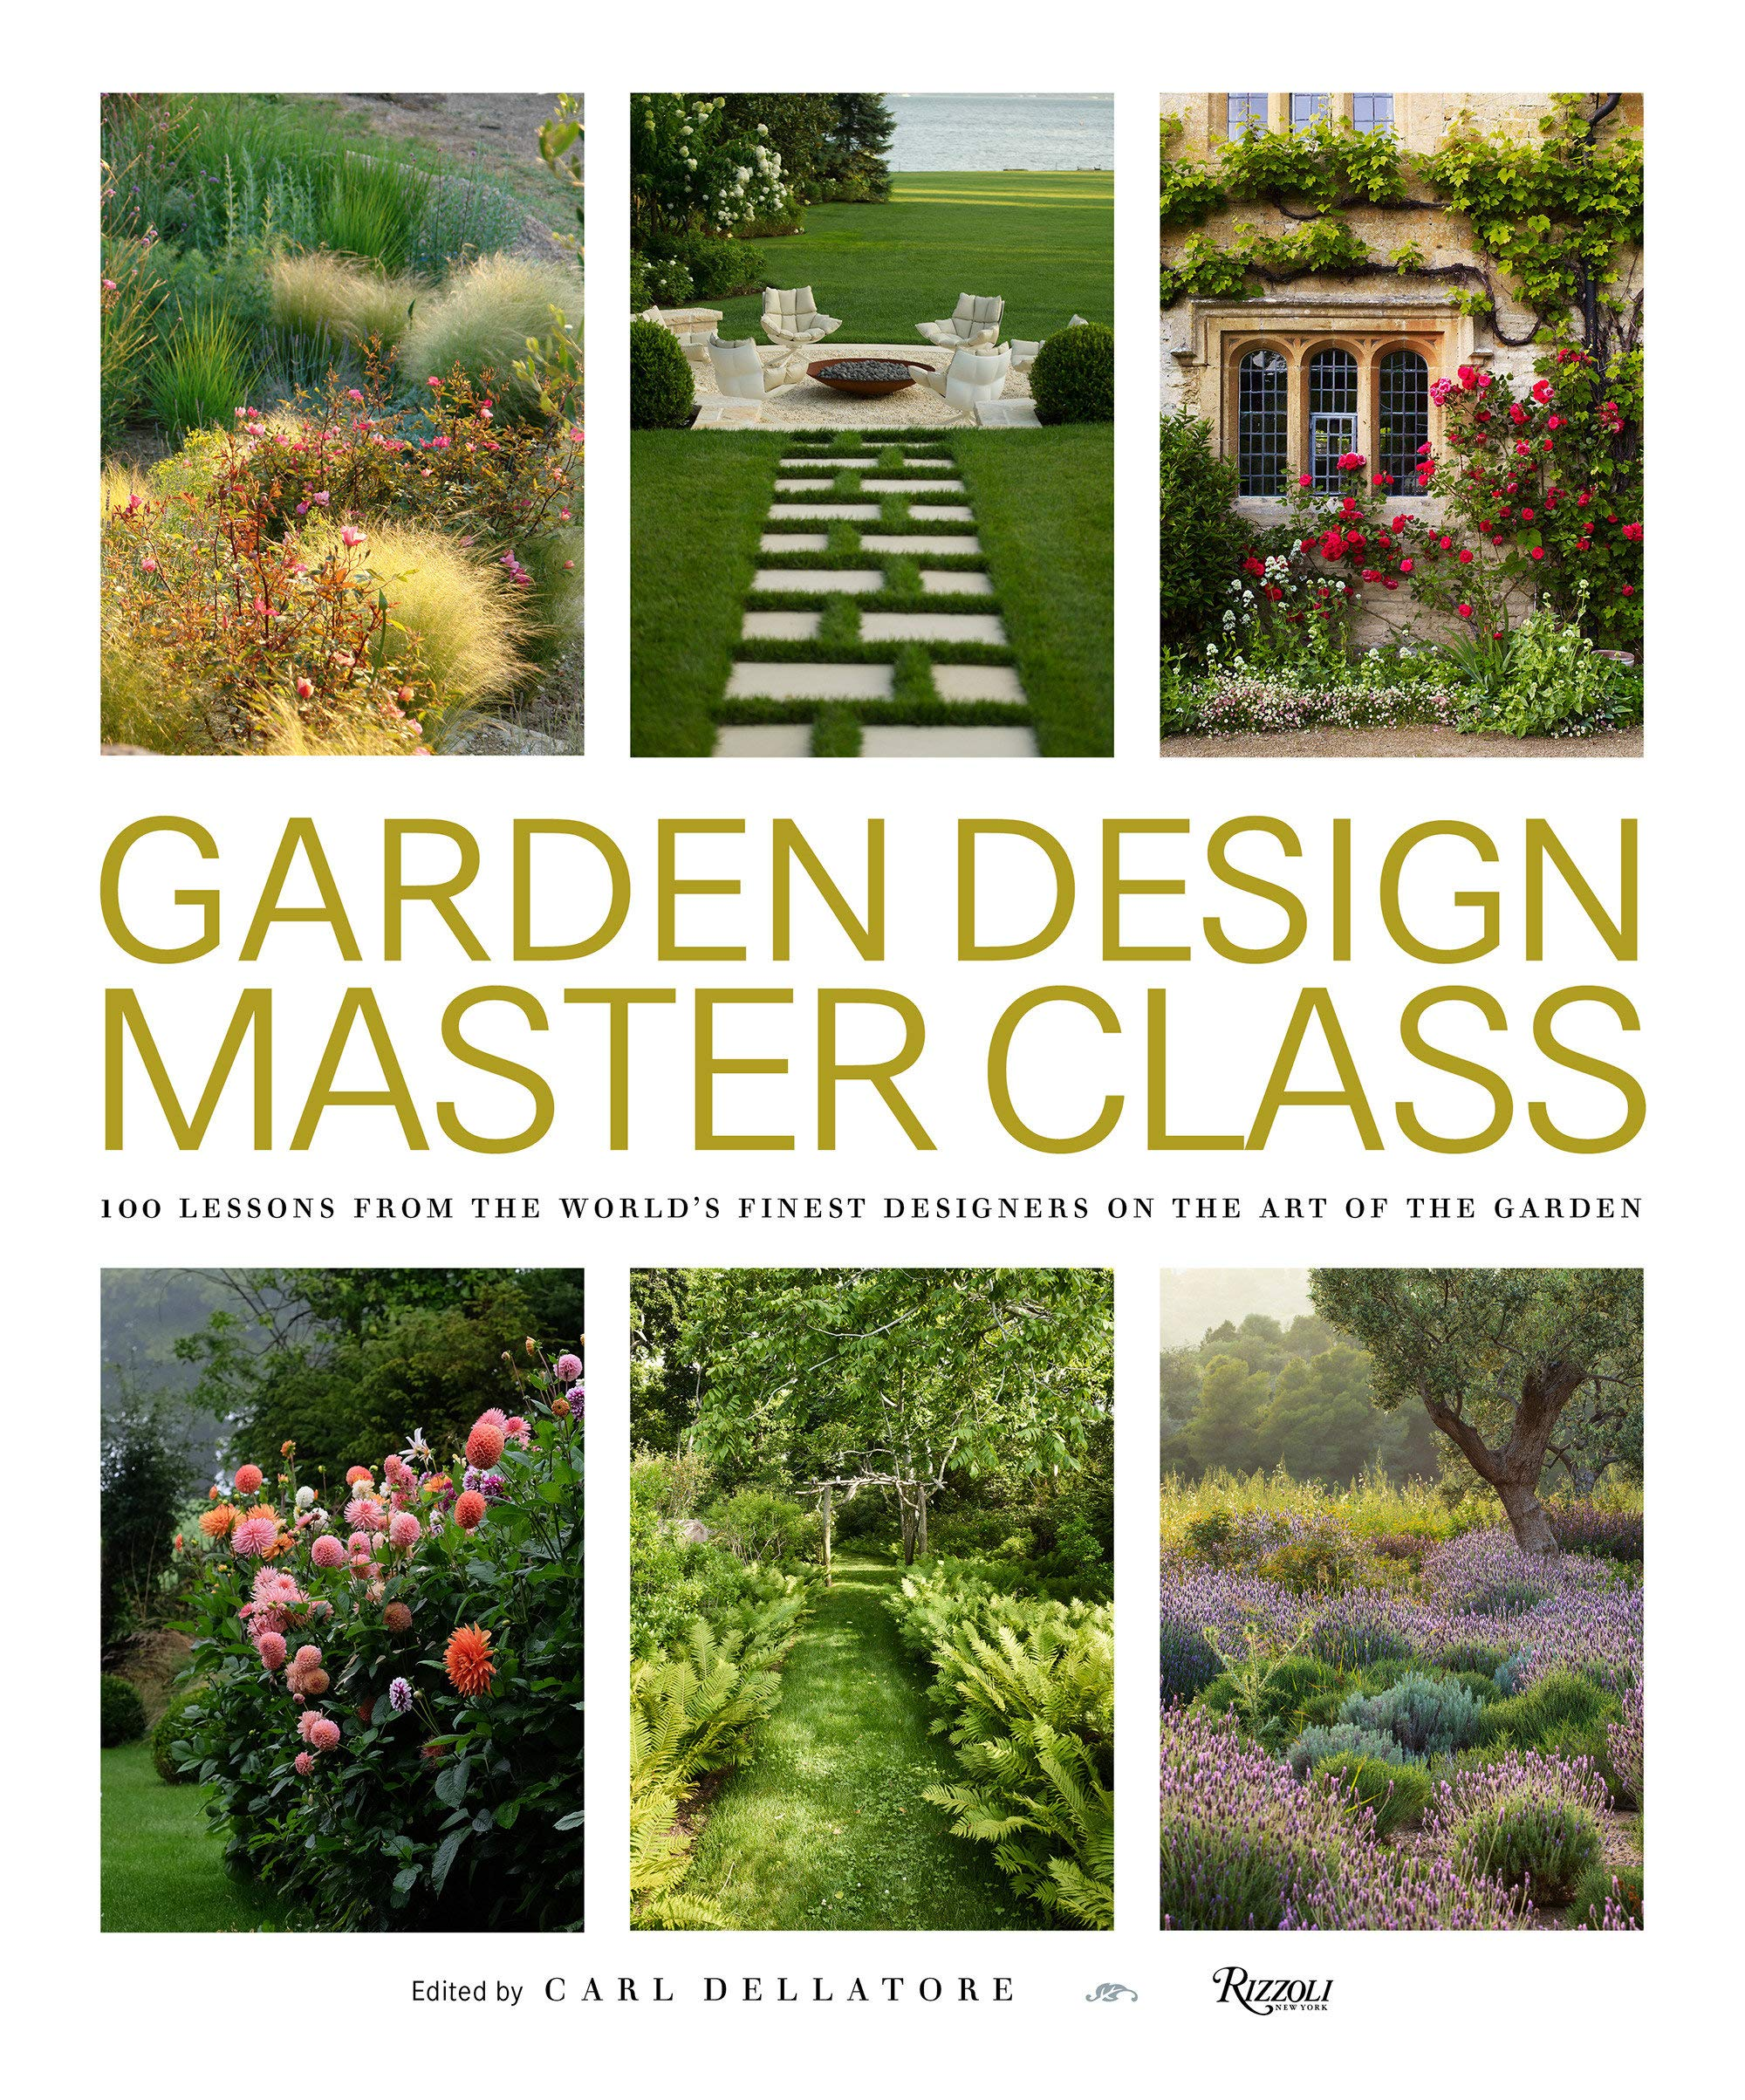 Garden Design Master Class 100 Lessons From The World S Finest Designers On The Art Of The Garden Dellatore Carl 9780847866663 Amazon Com Books